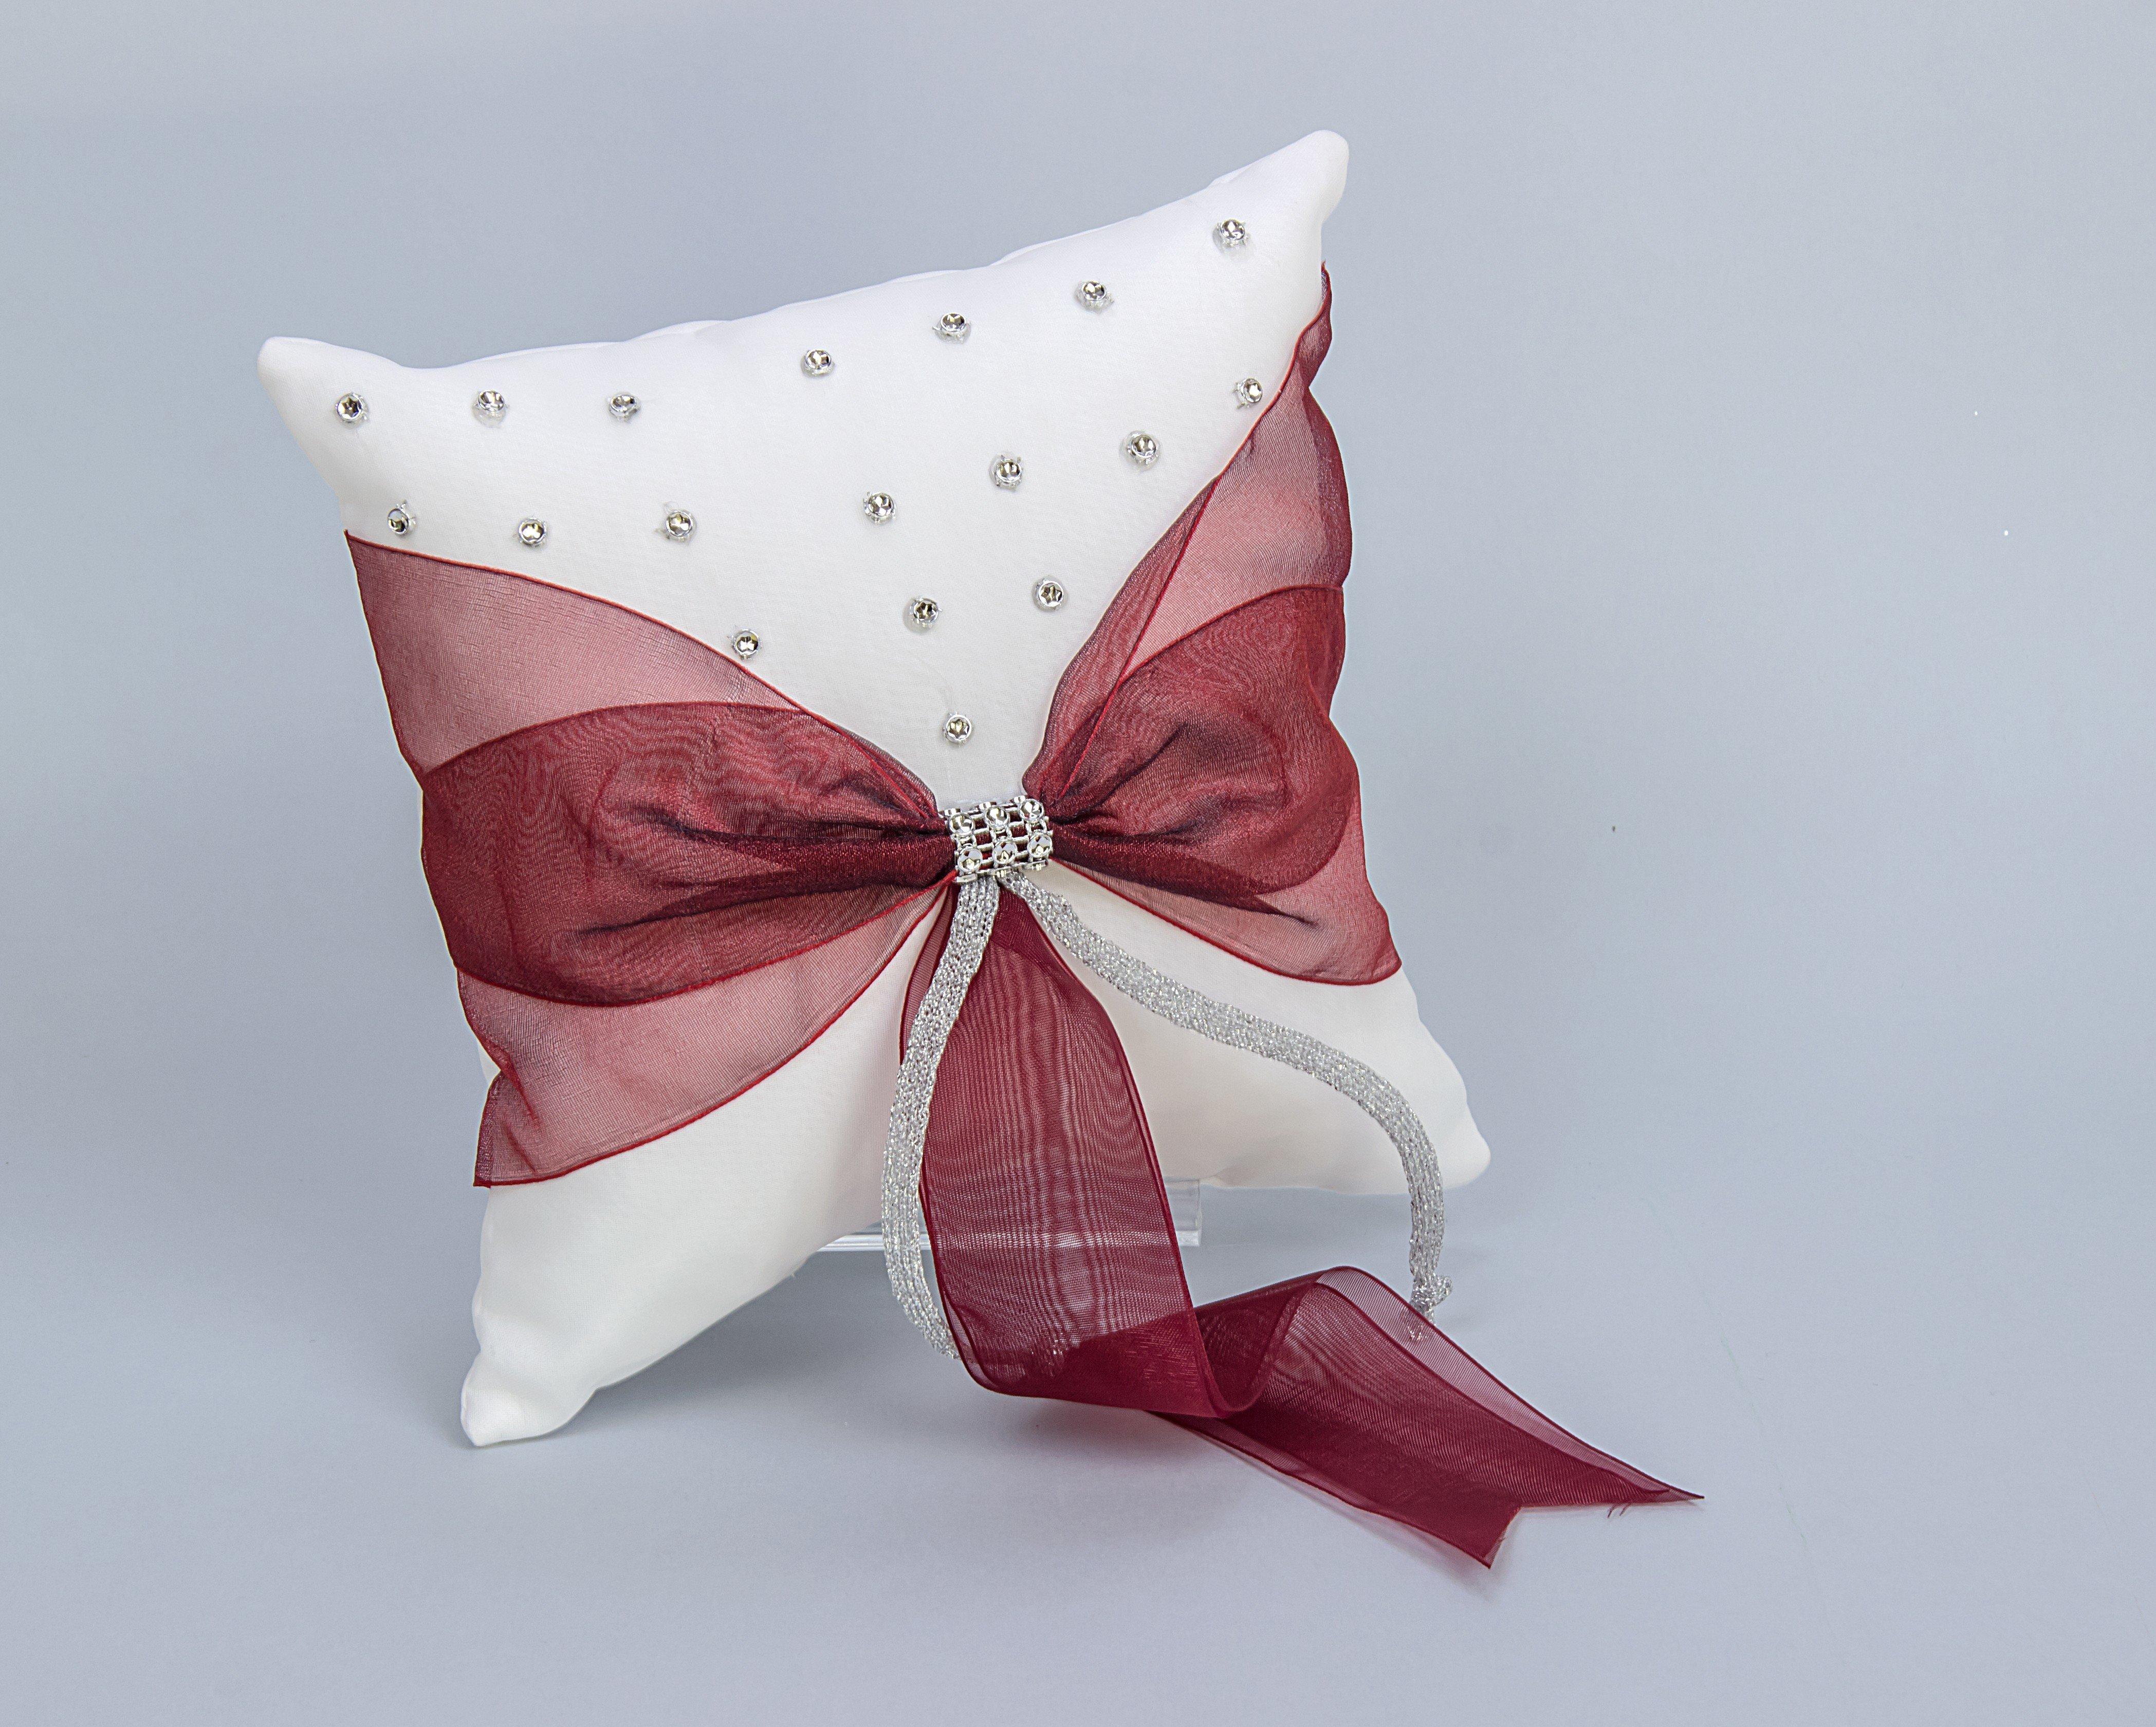 coussins pas chers coussin deco canape coussin de canapac coussin decoratif pour canape pas. Black Bedroom Furniture Sets. Home Design Ideas